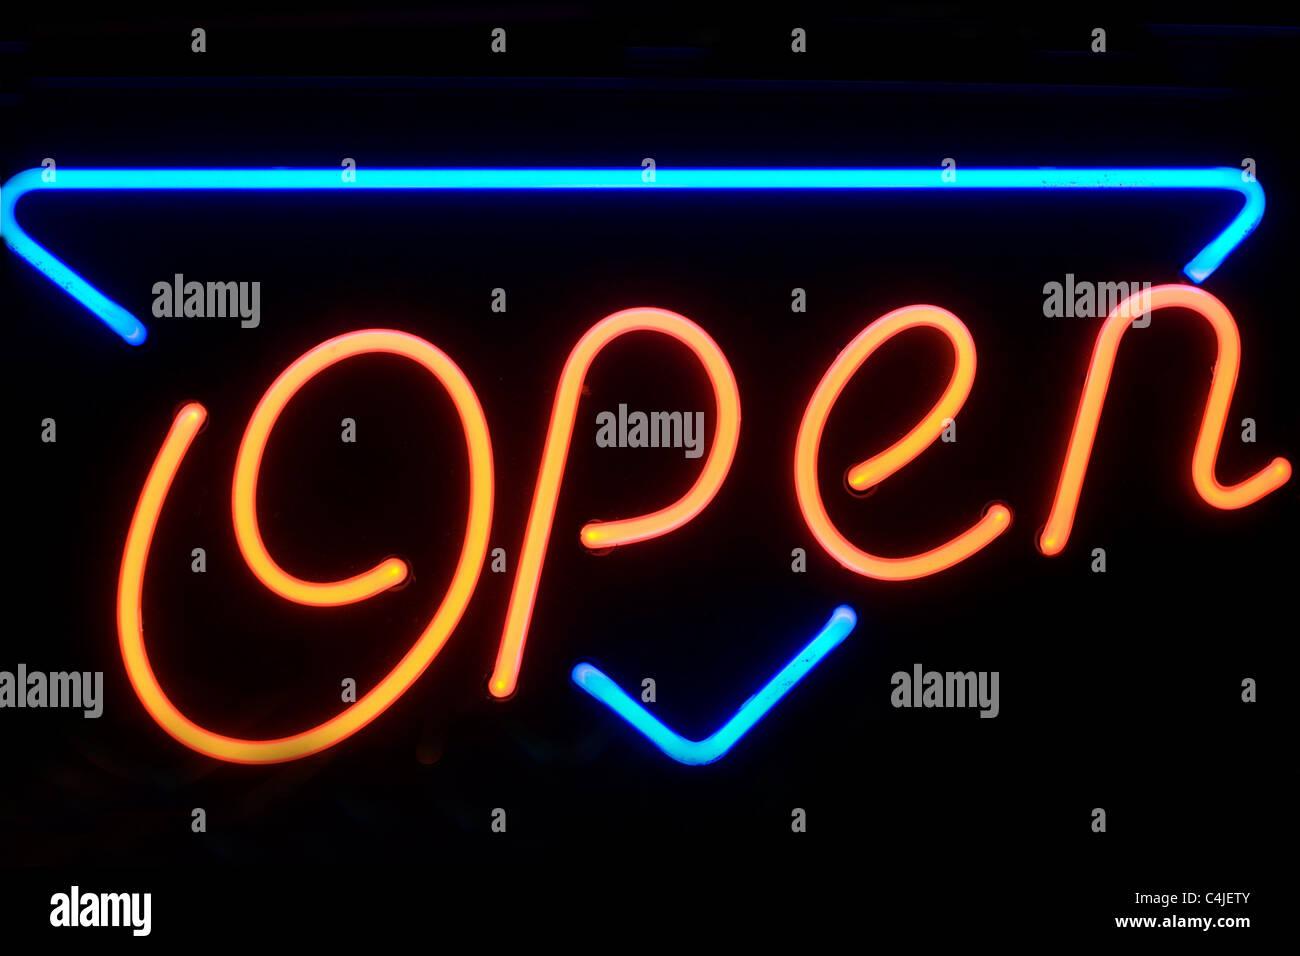 open - Stock Image